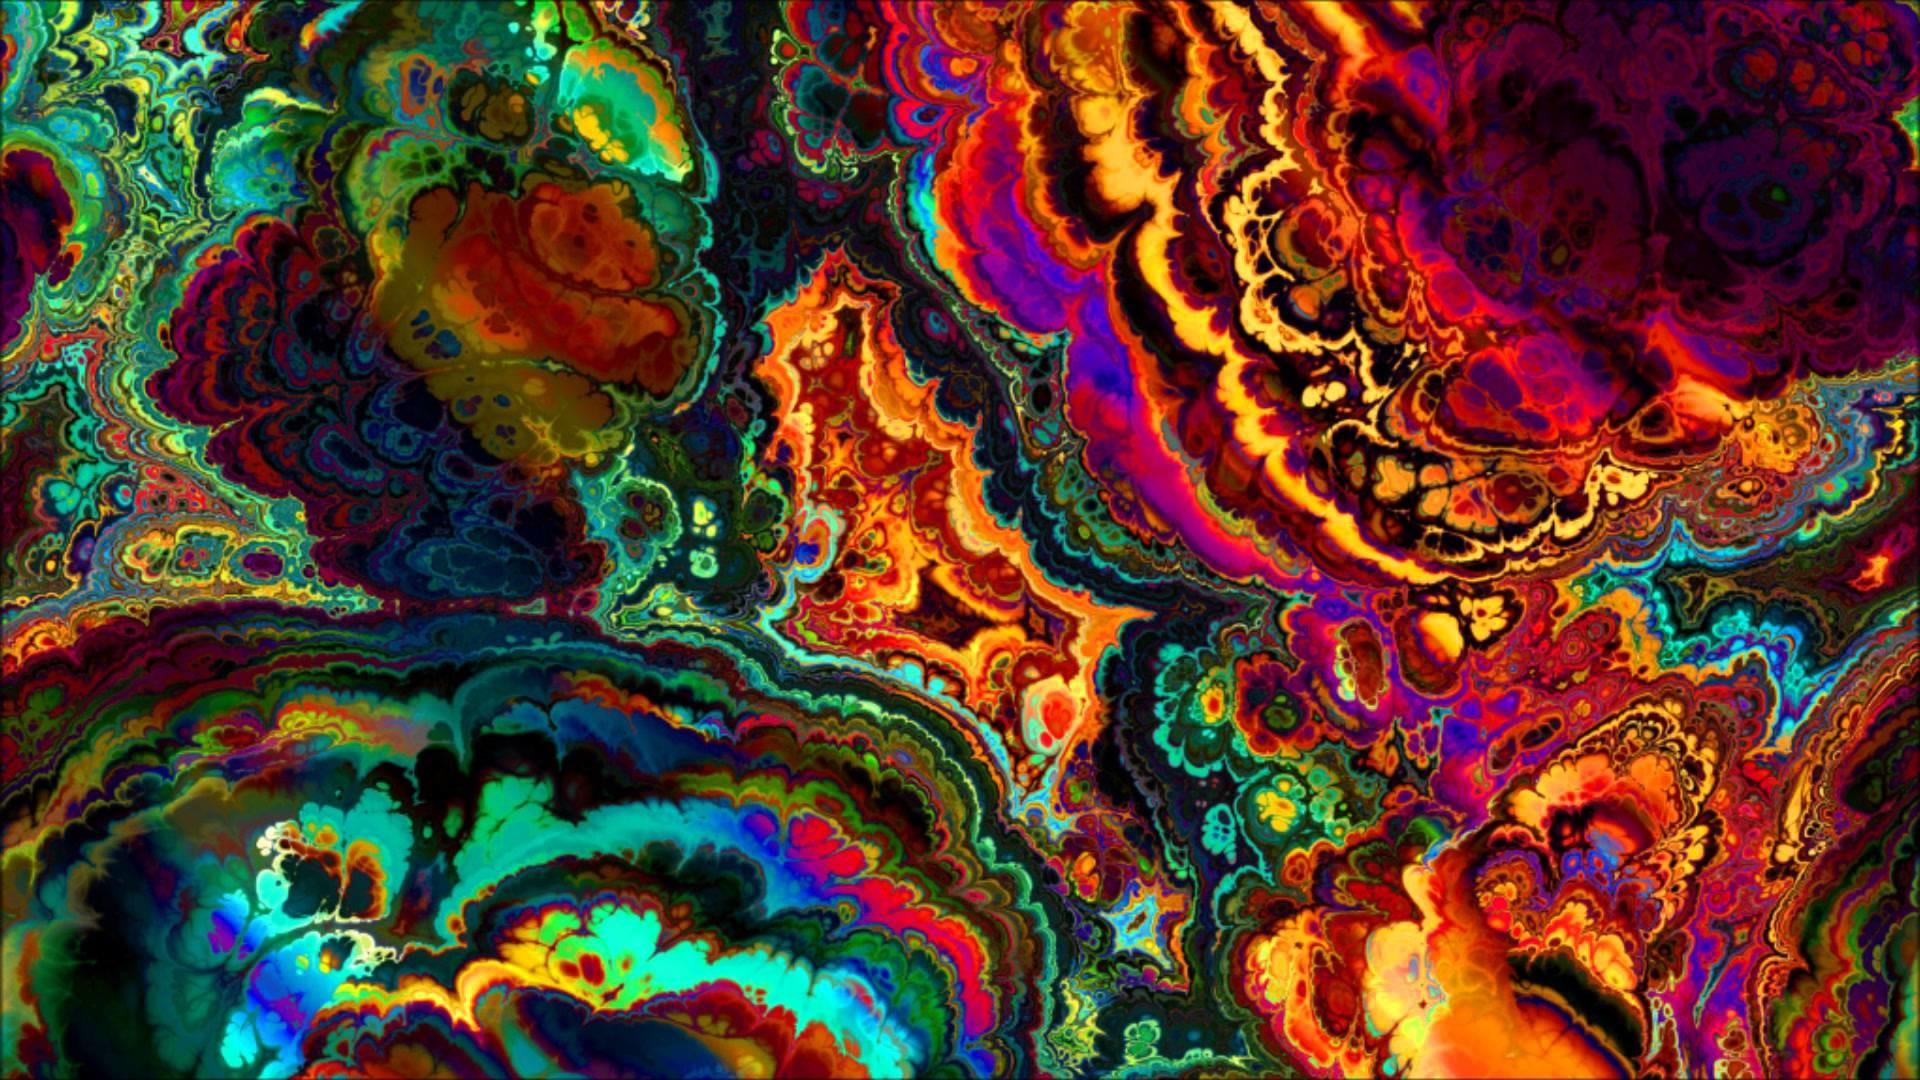 Trippy Stoner Wallpaper (58+ images)